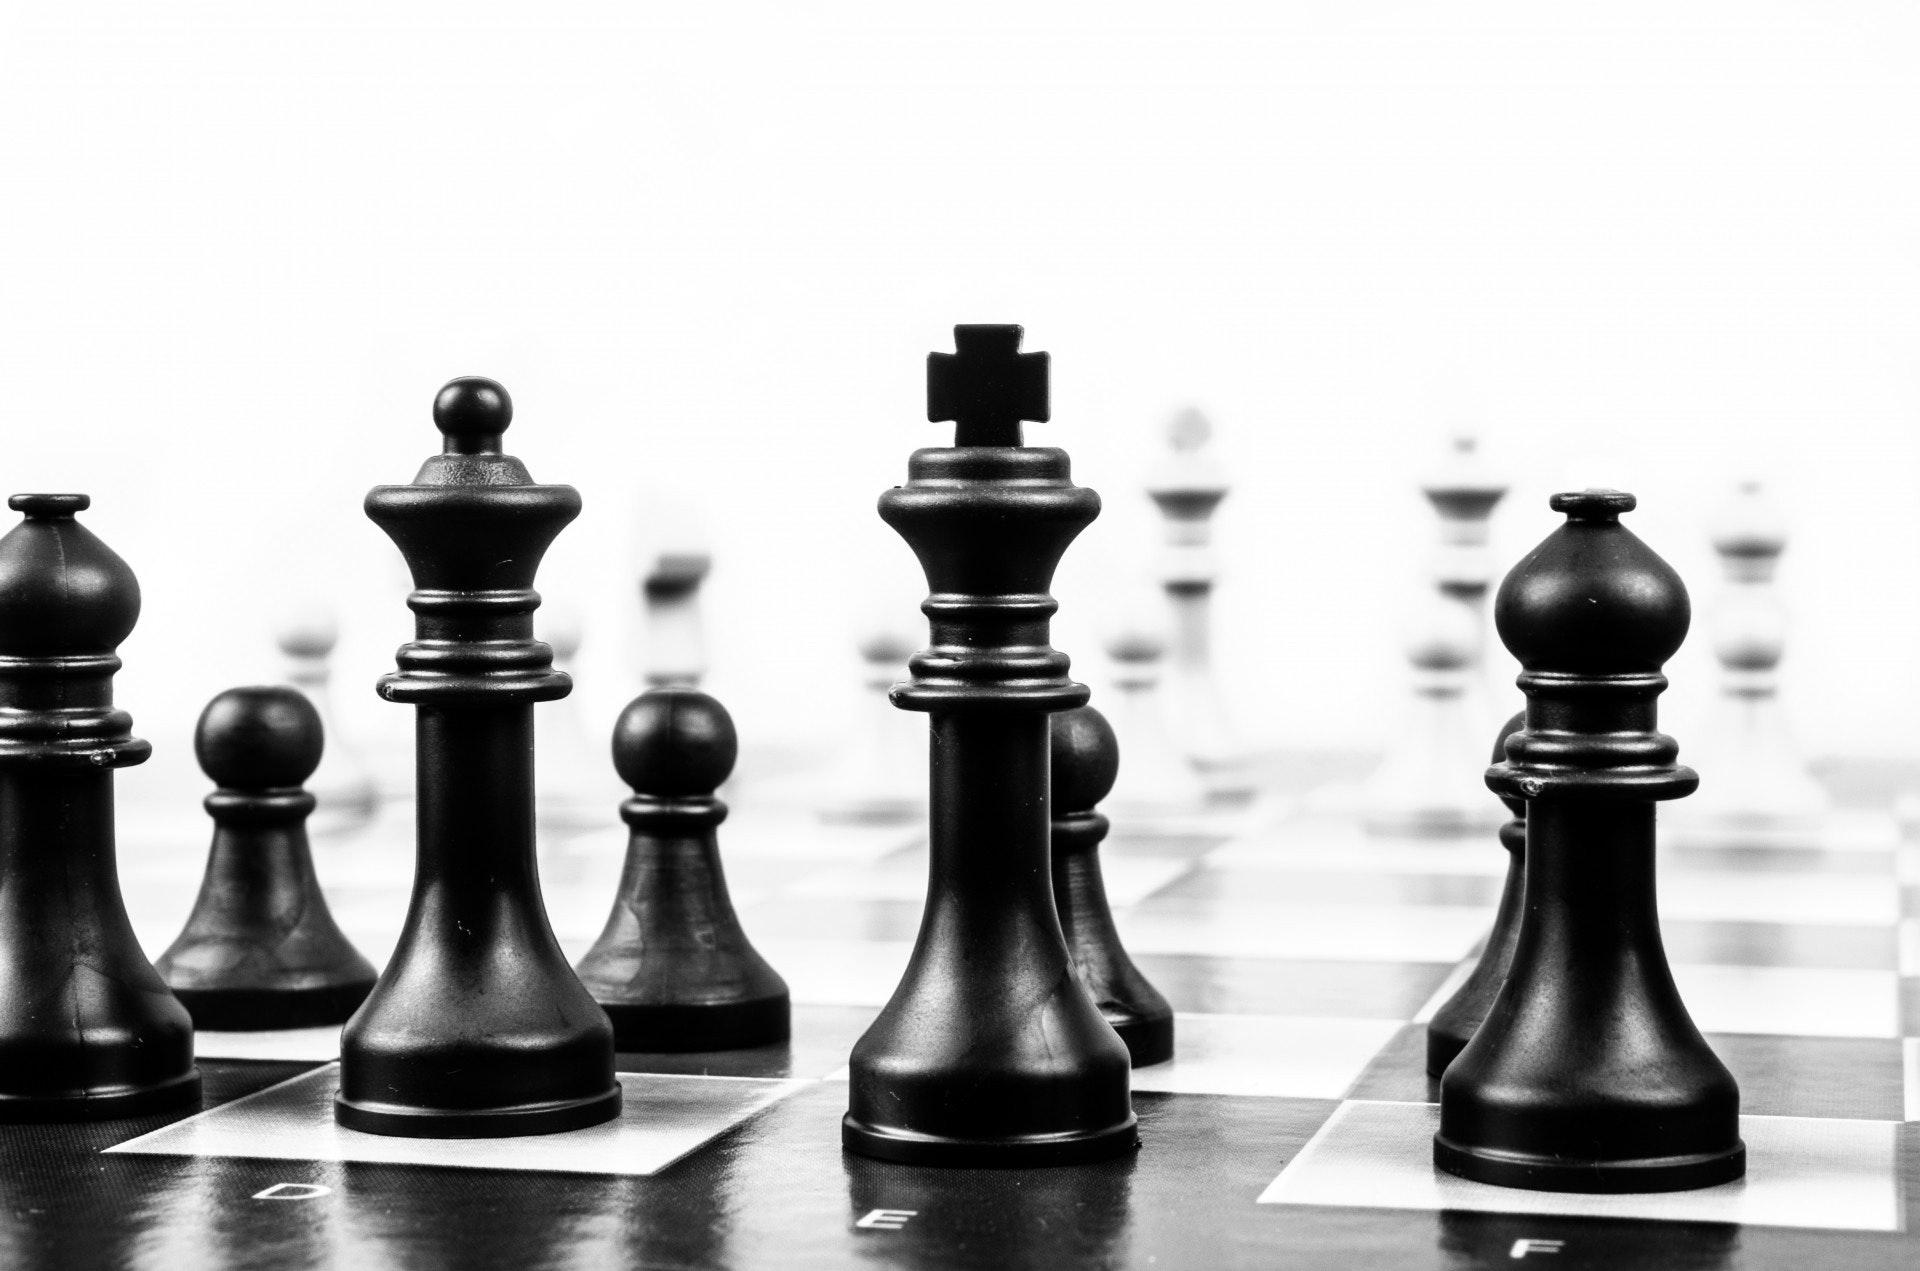 Wooden black chess piece photo